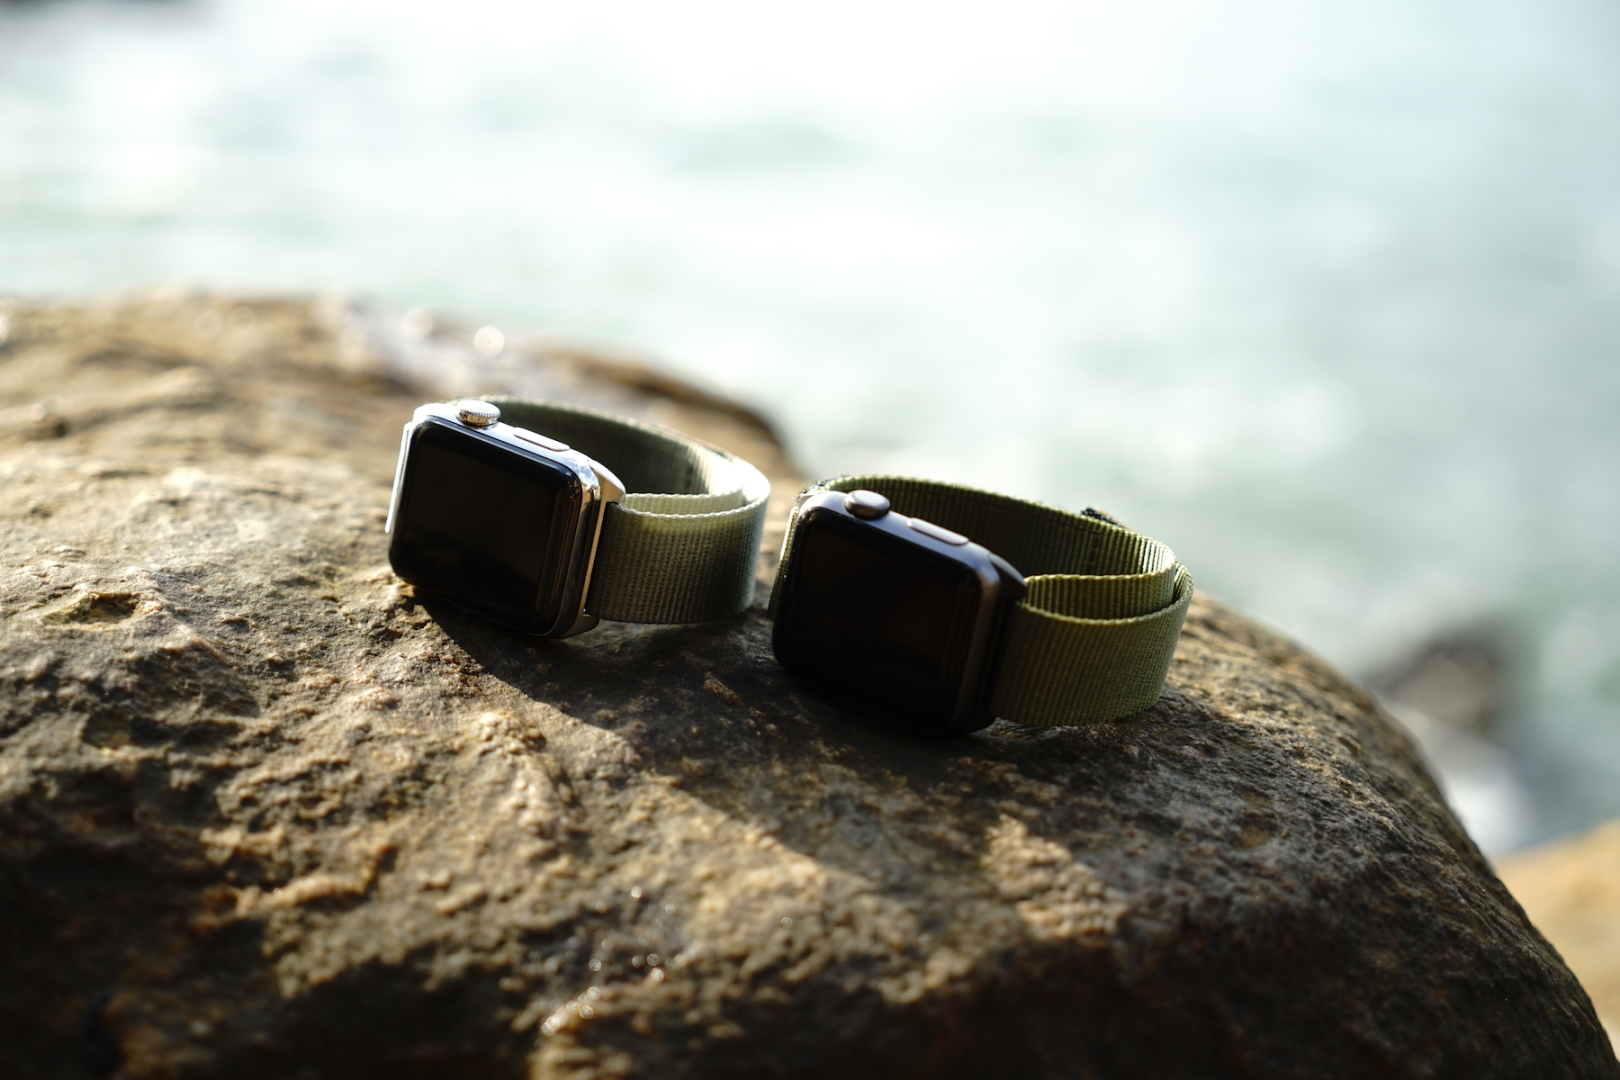 monowear-nylon-active-apple-watch-band-01